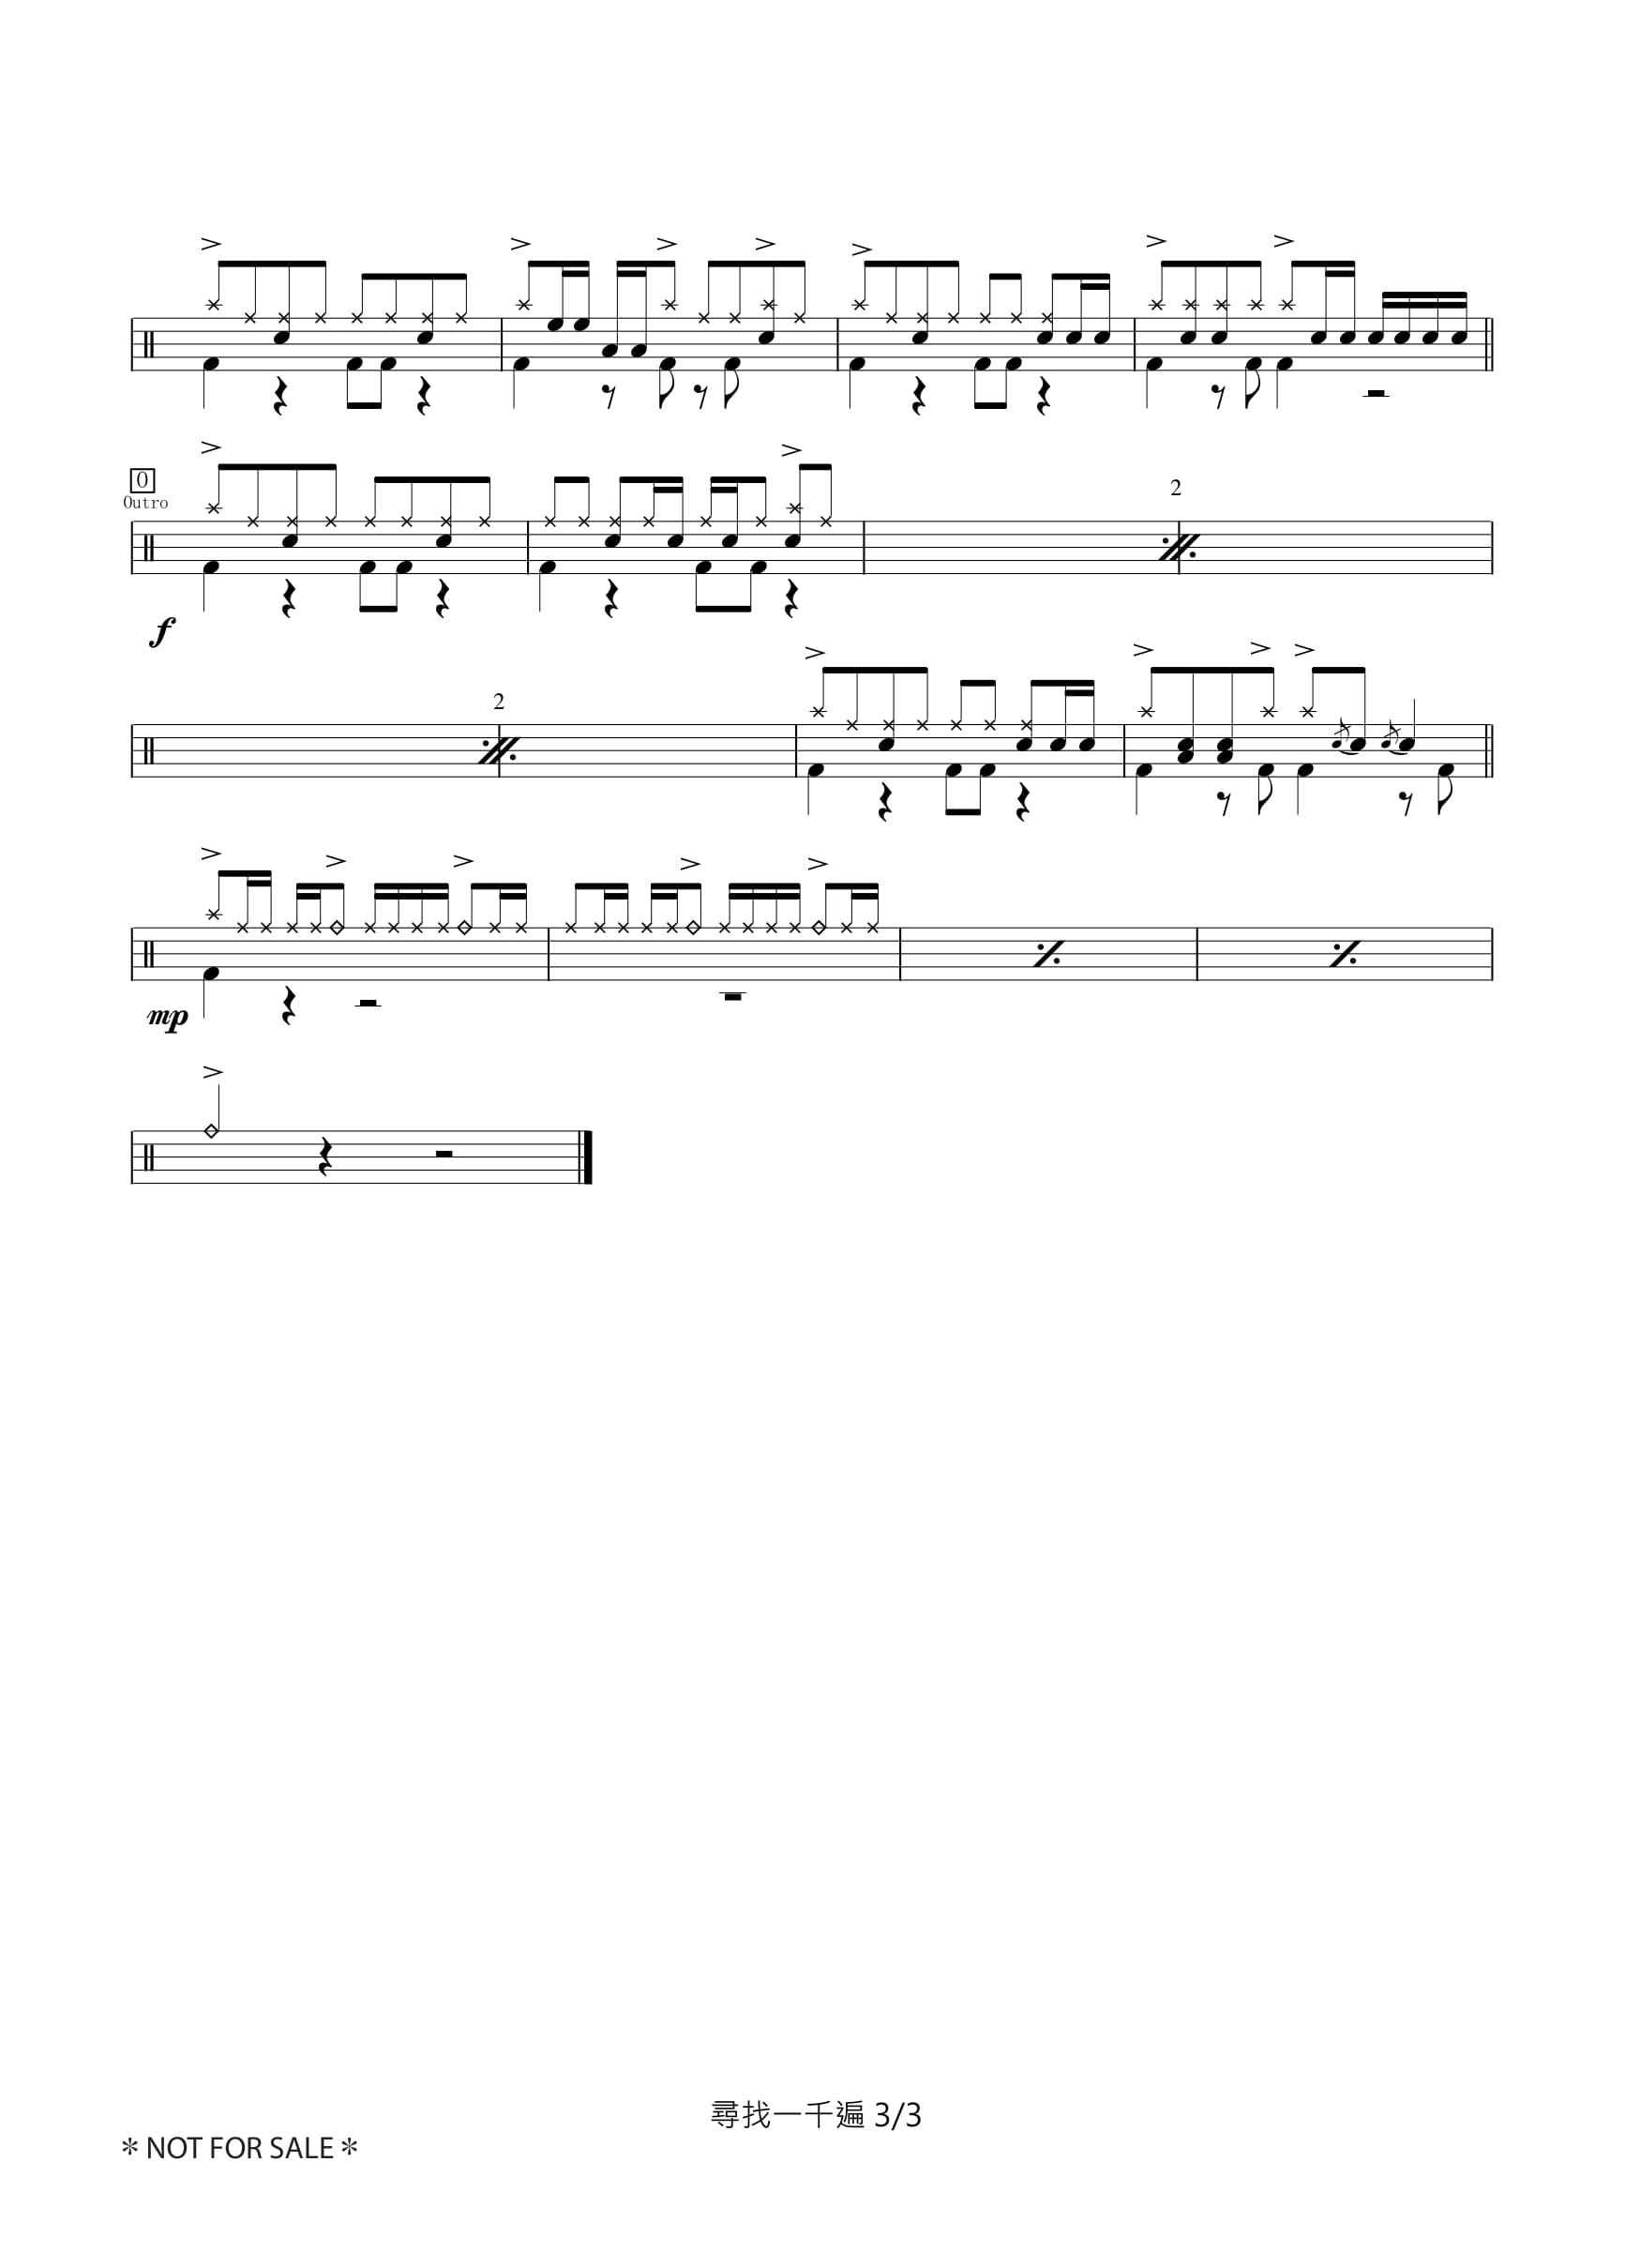 Mr. – 尋找一千遍 (鼓譜) – Drumpro 鼓譜分享